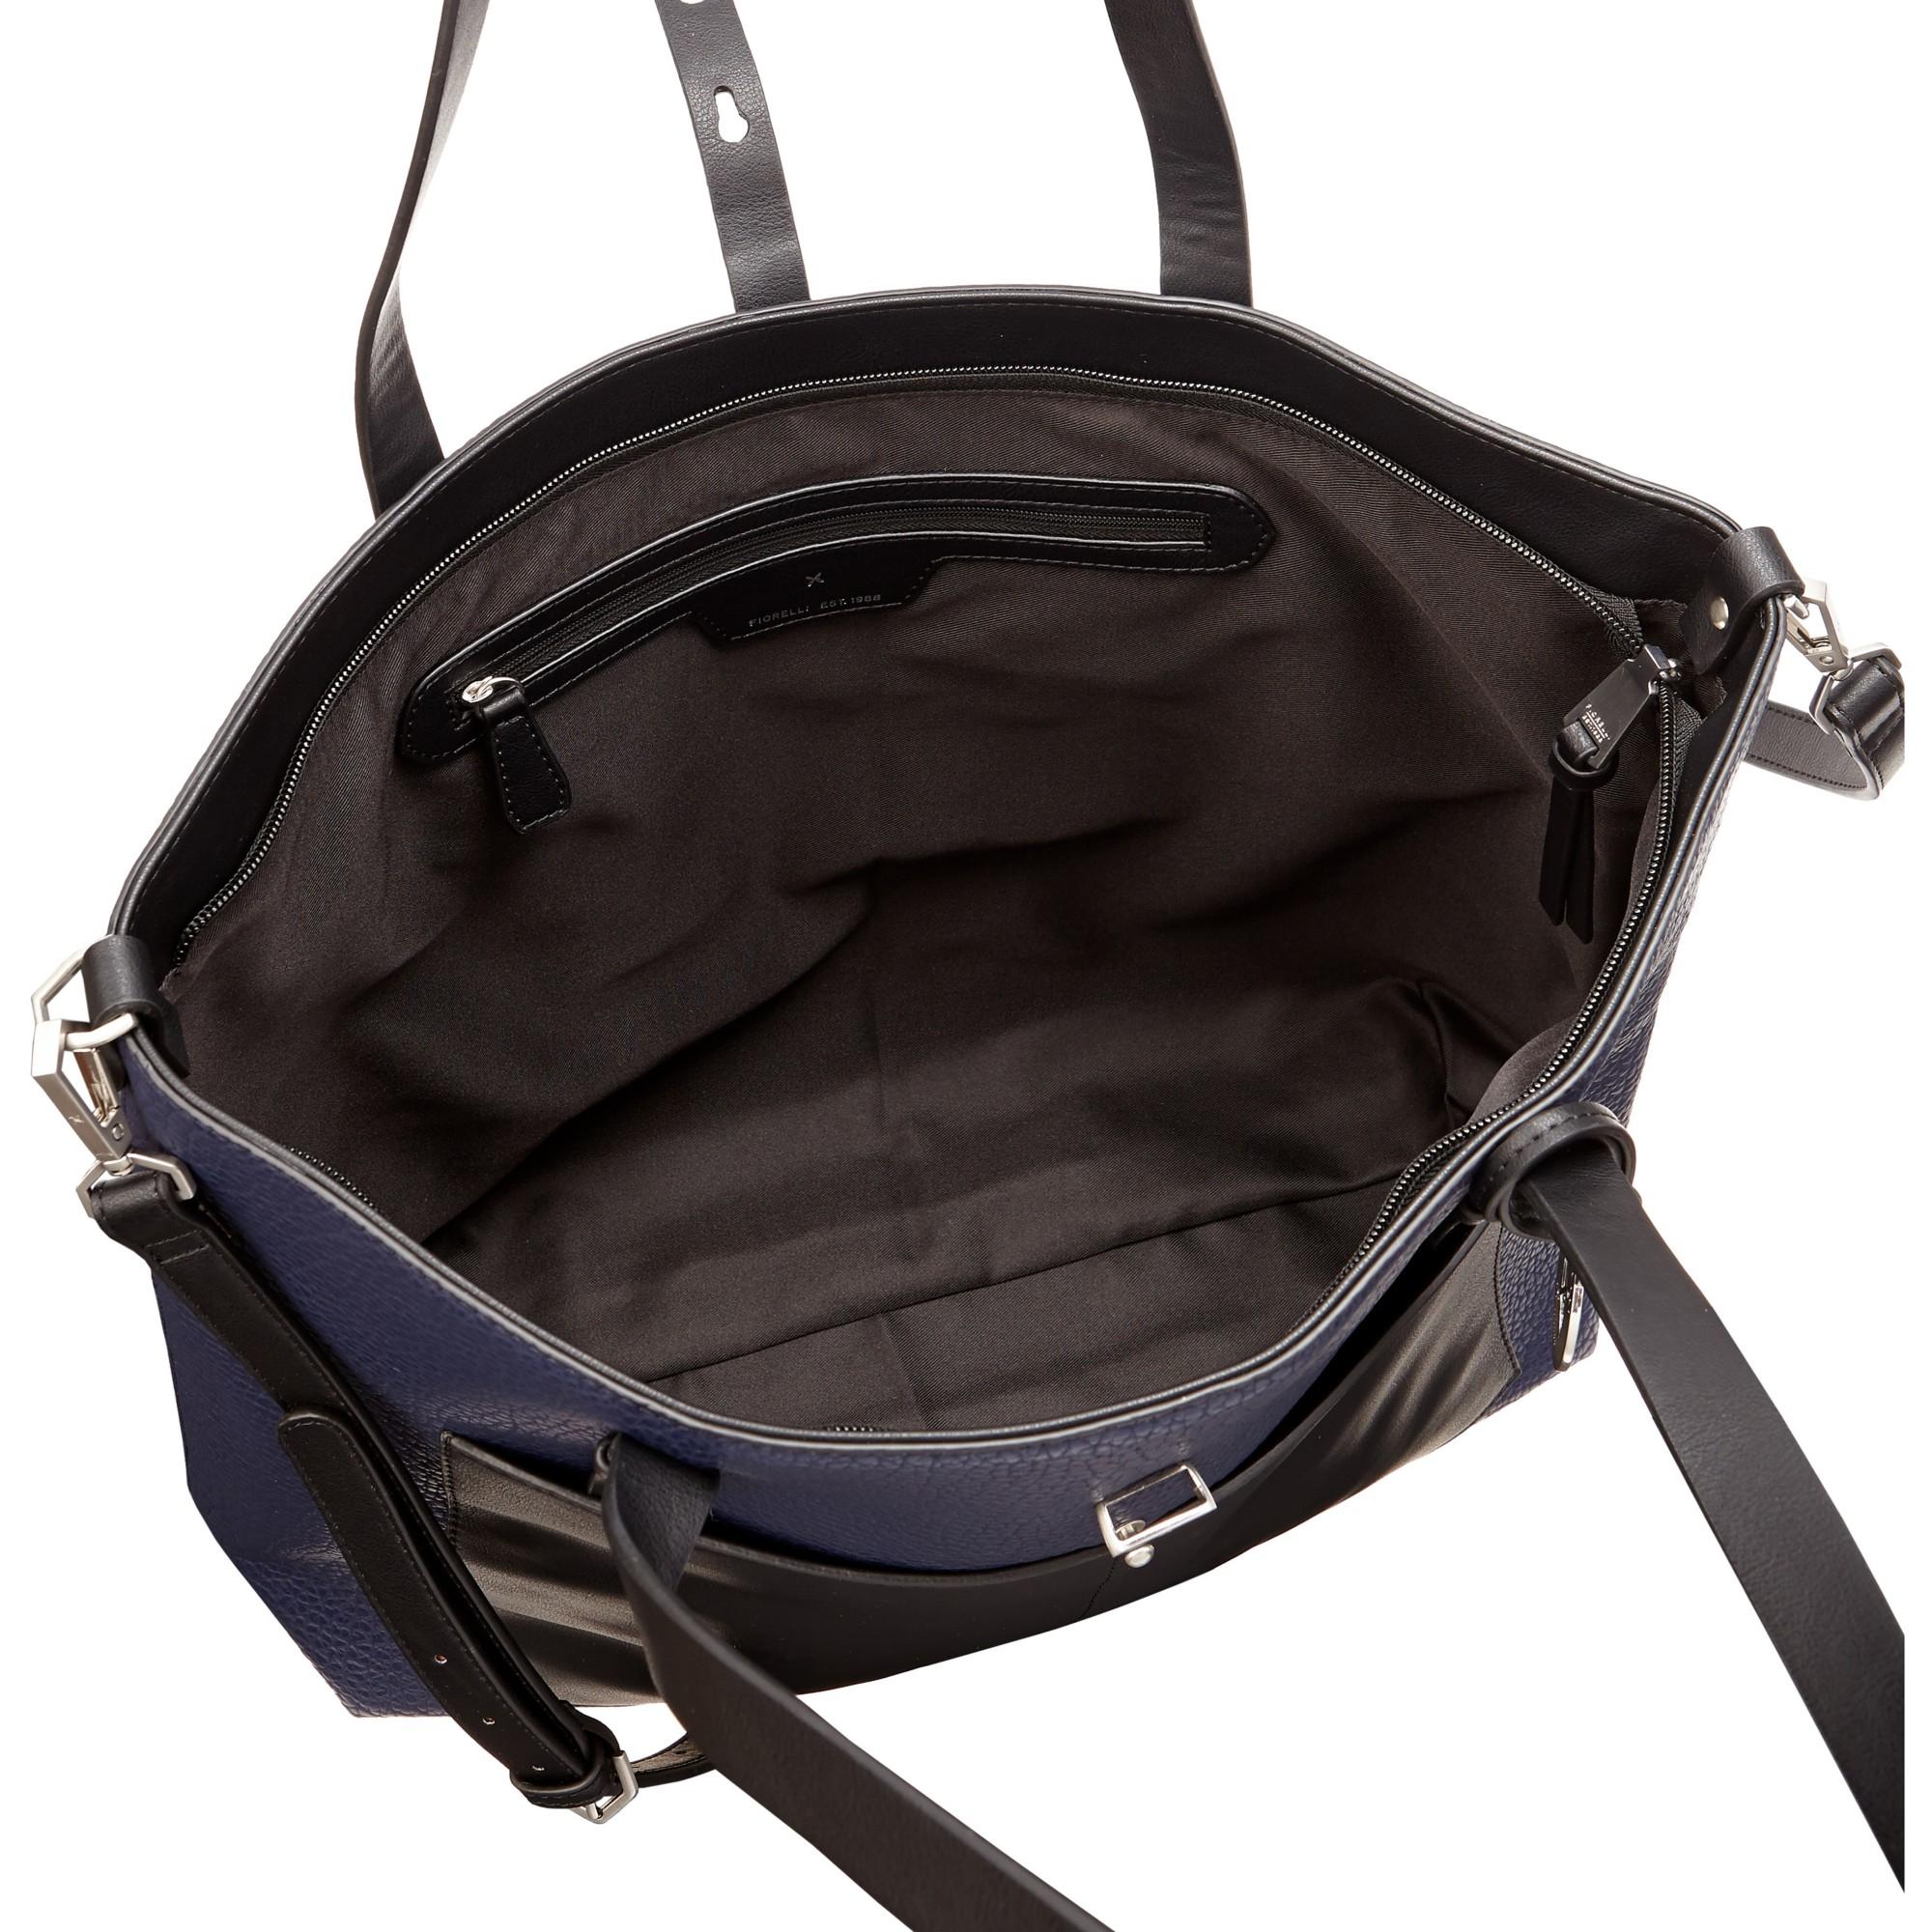 Fiorelli Austyn Tote Bag in Navy (Blue)